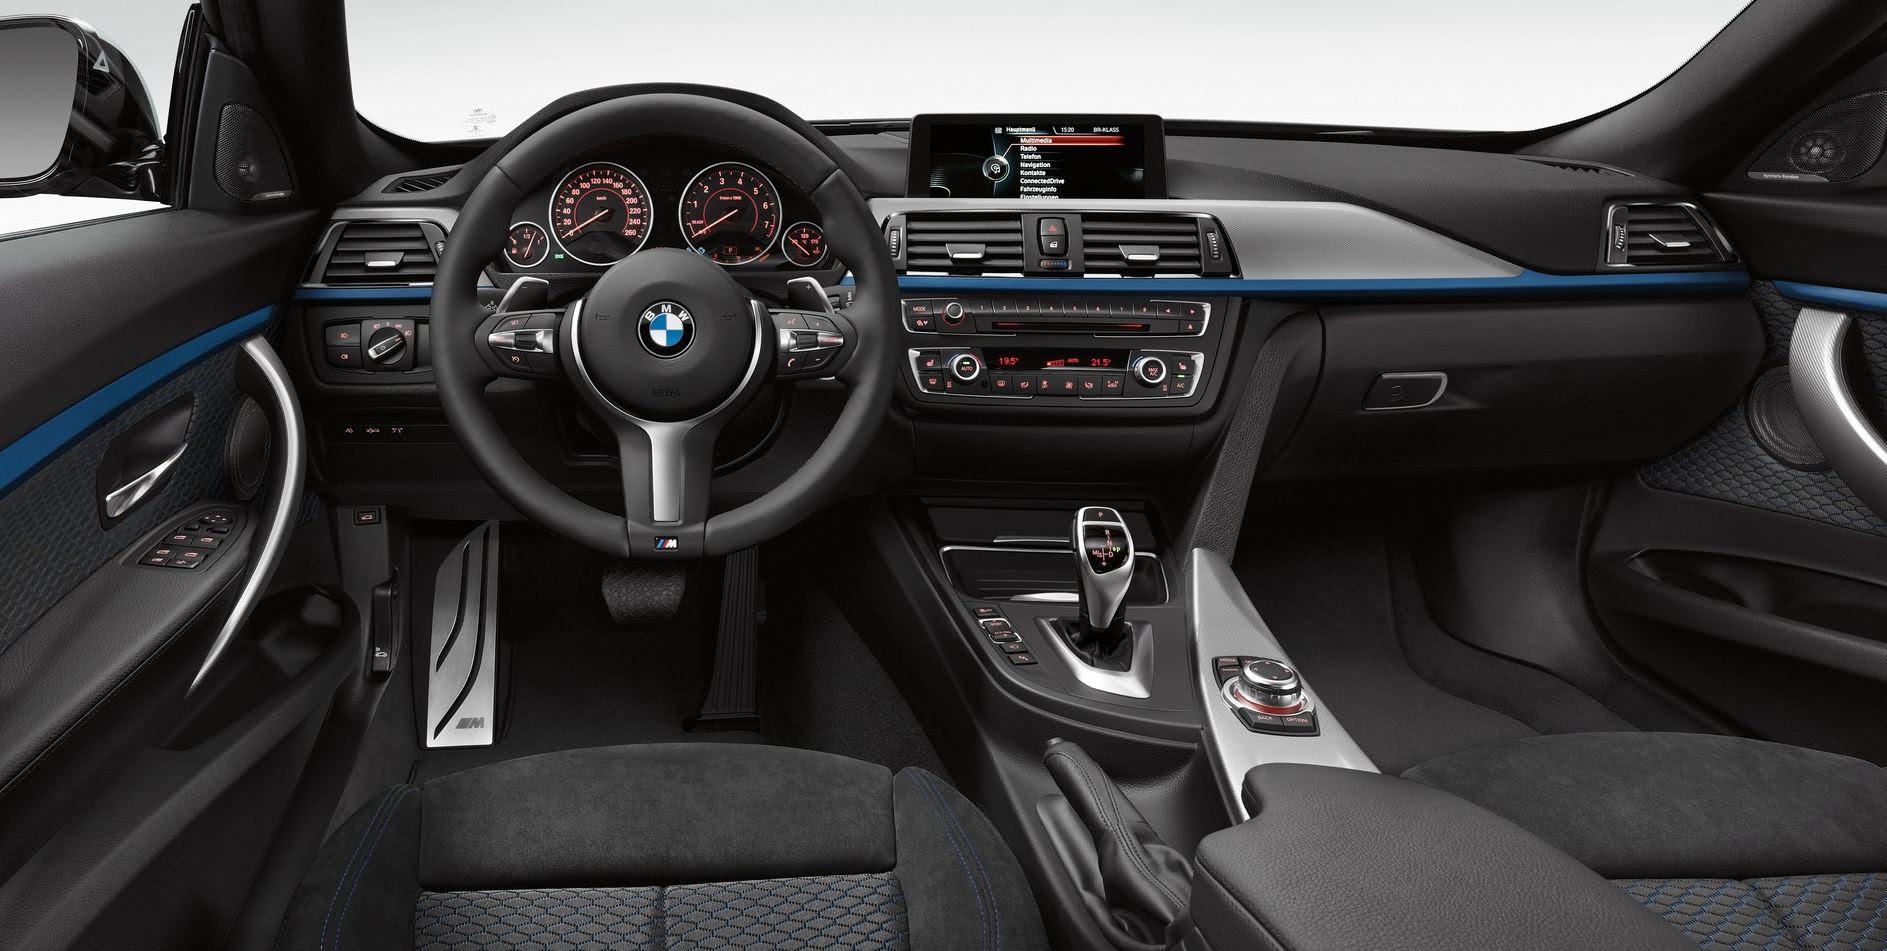 2013 Bmw 328i M Sport Interior Thxsiempre